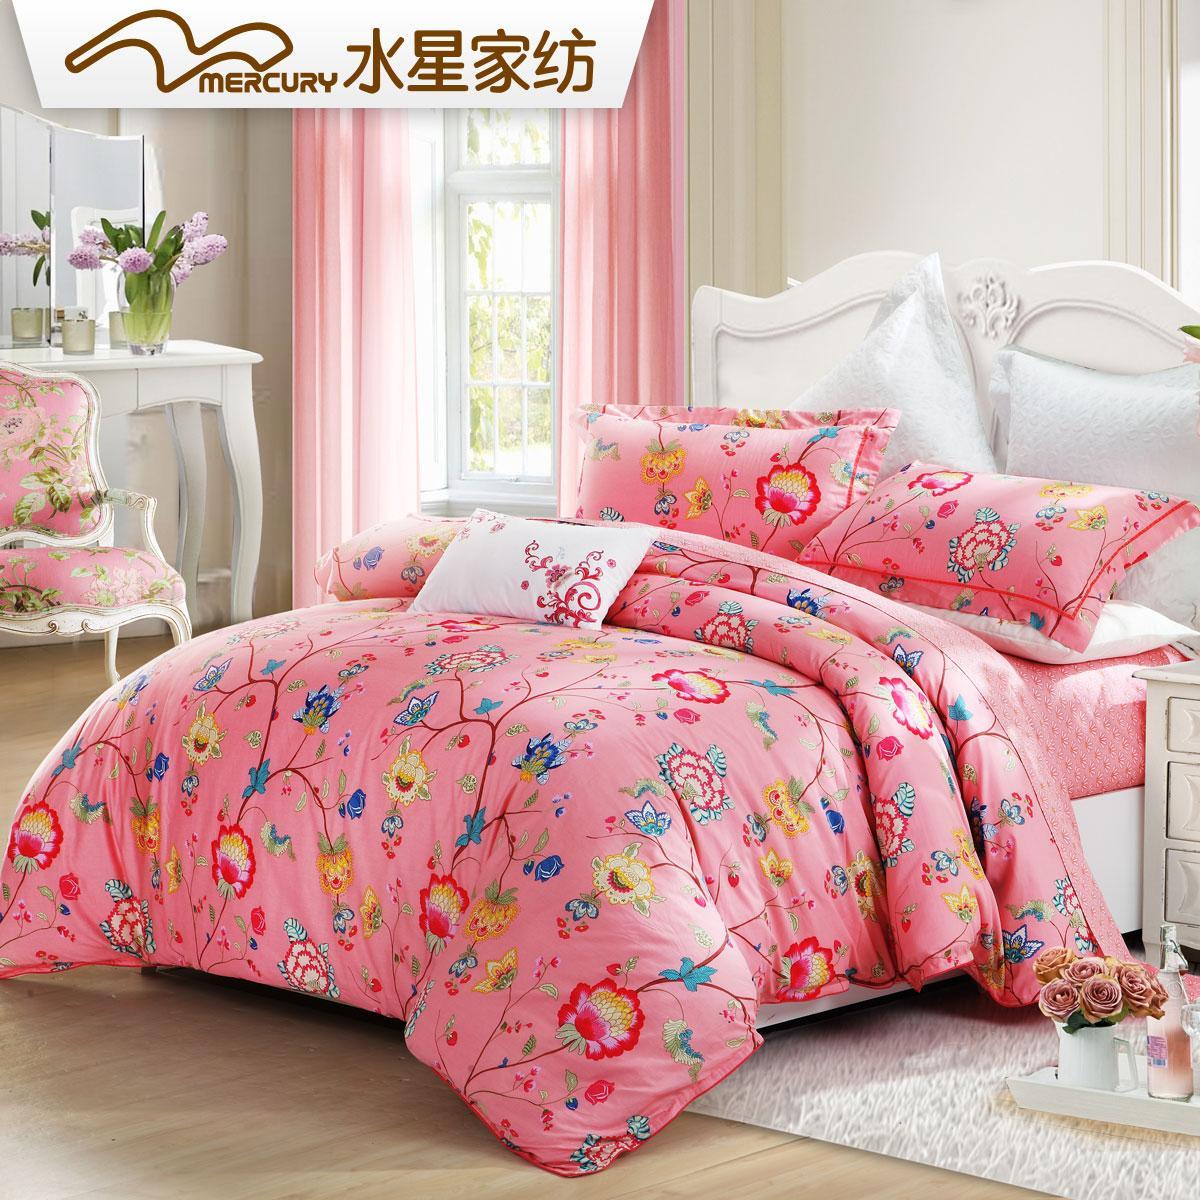 !Mercury Home Textile Flower Of Life 100% Cotton Reactive